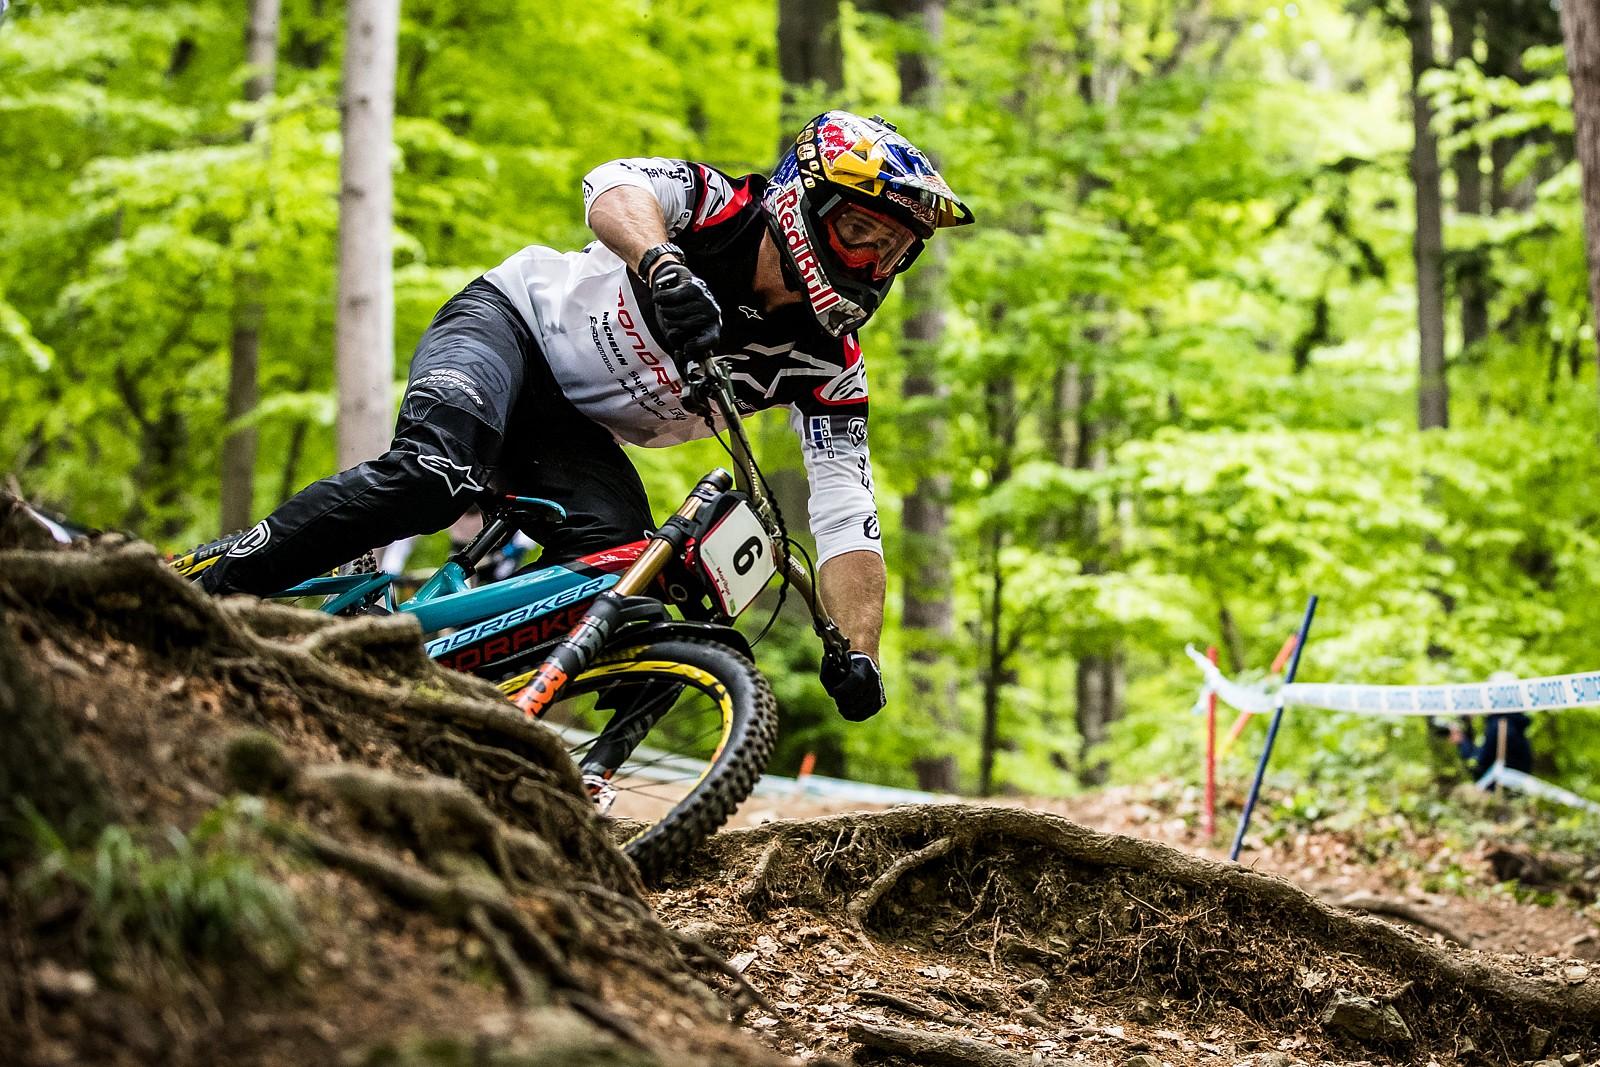 Brook Macdonald, Maribor World Cup - A Big Bad Batch of Brook Macdonald Bangers - Mountain Biking Pictures - Vital MTB